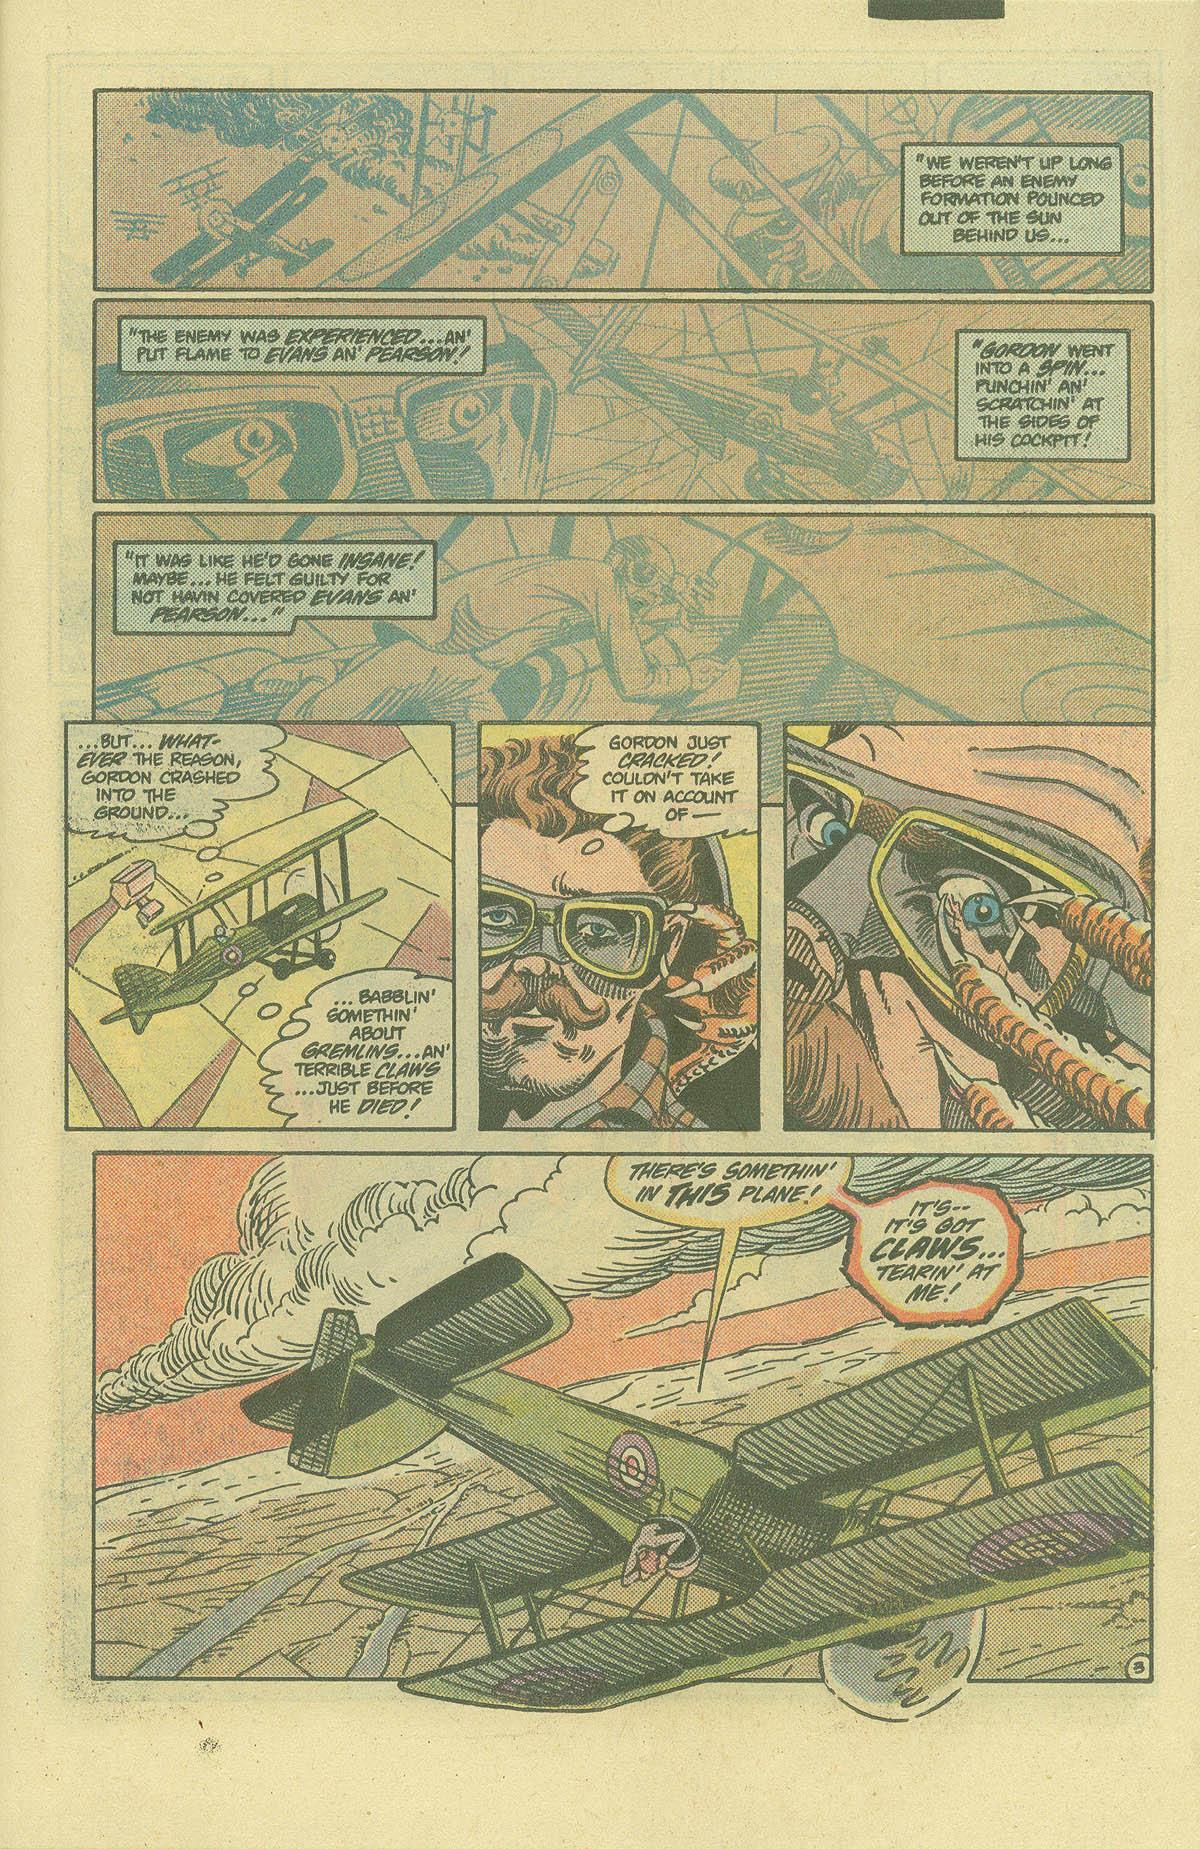 Read online Sgt. Rock comic -  Issue #394 - 25